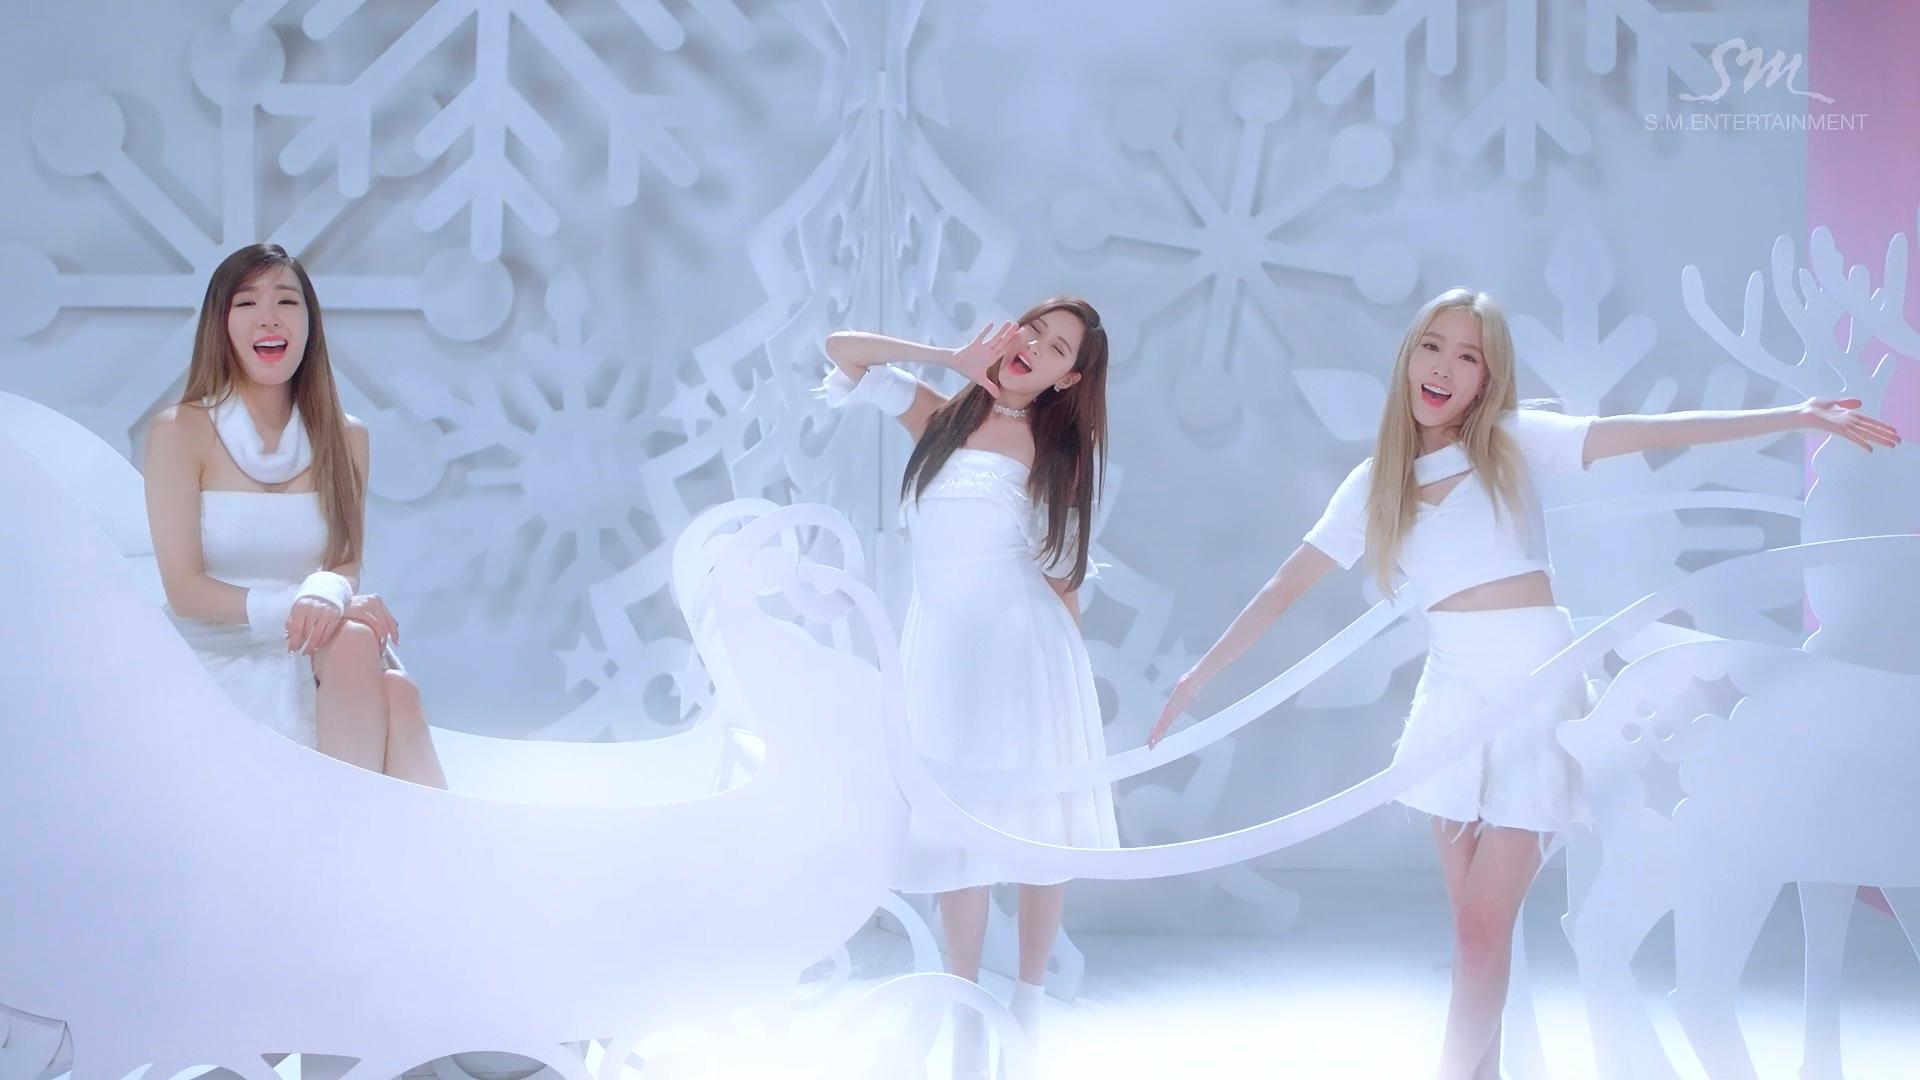 Download [MV] Girls Generation TTS Dear Santa [Bugs HD 1080p] 1920x1080